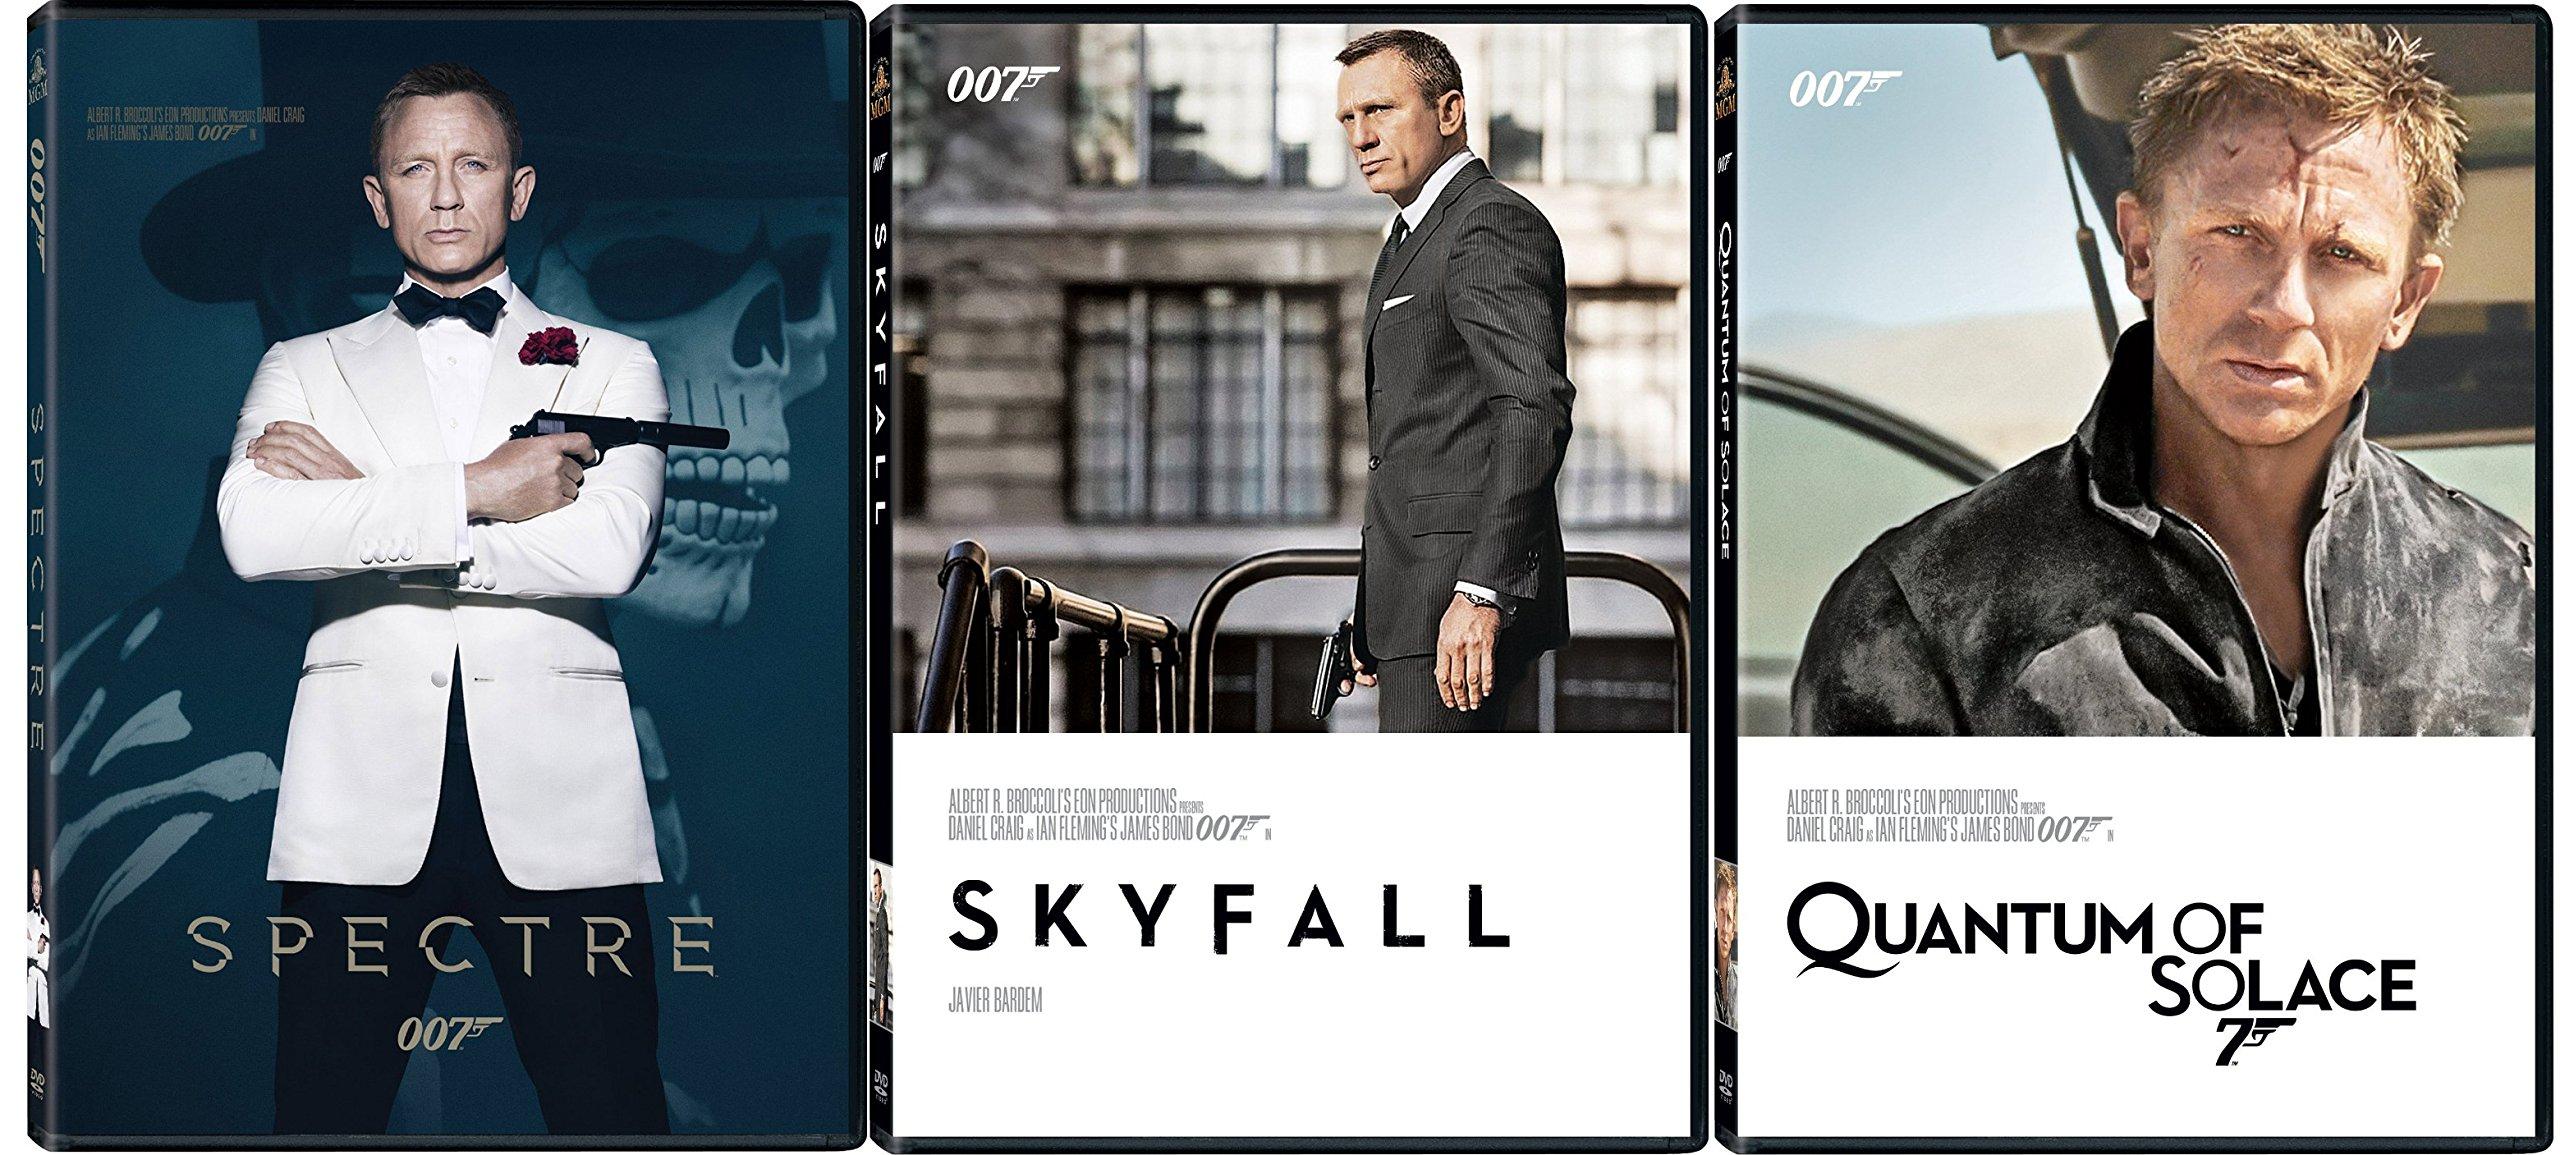 James Bond Film Collection 23/24/25 Quantum of Solace - Skyfall & Spectre 007 DVD Daniel Craig three films Action Movie Set